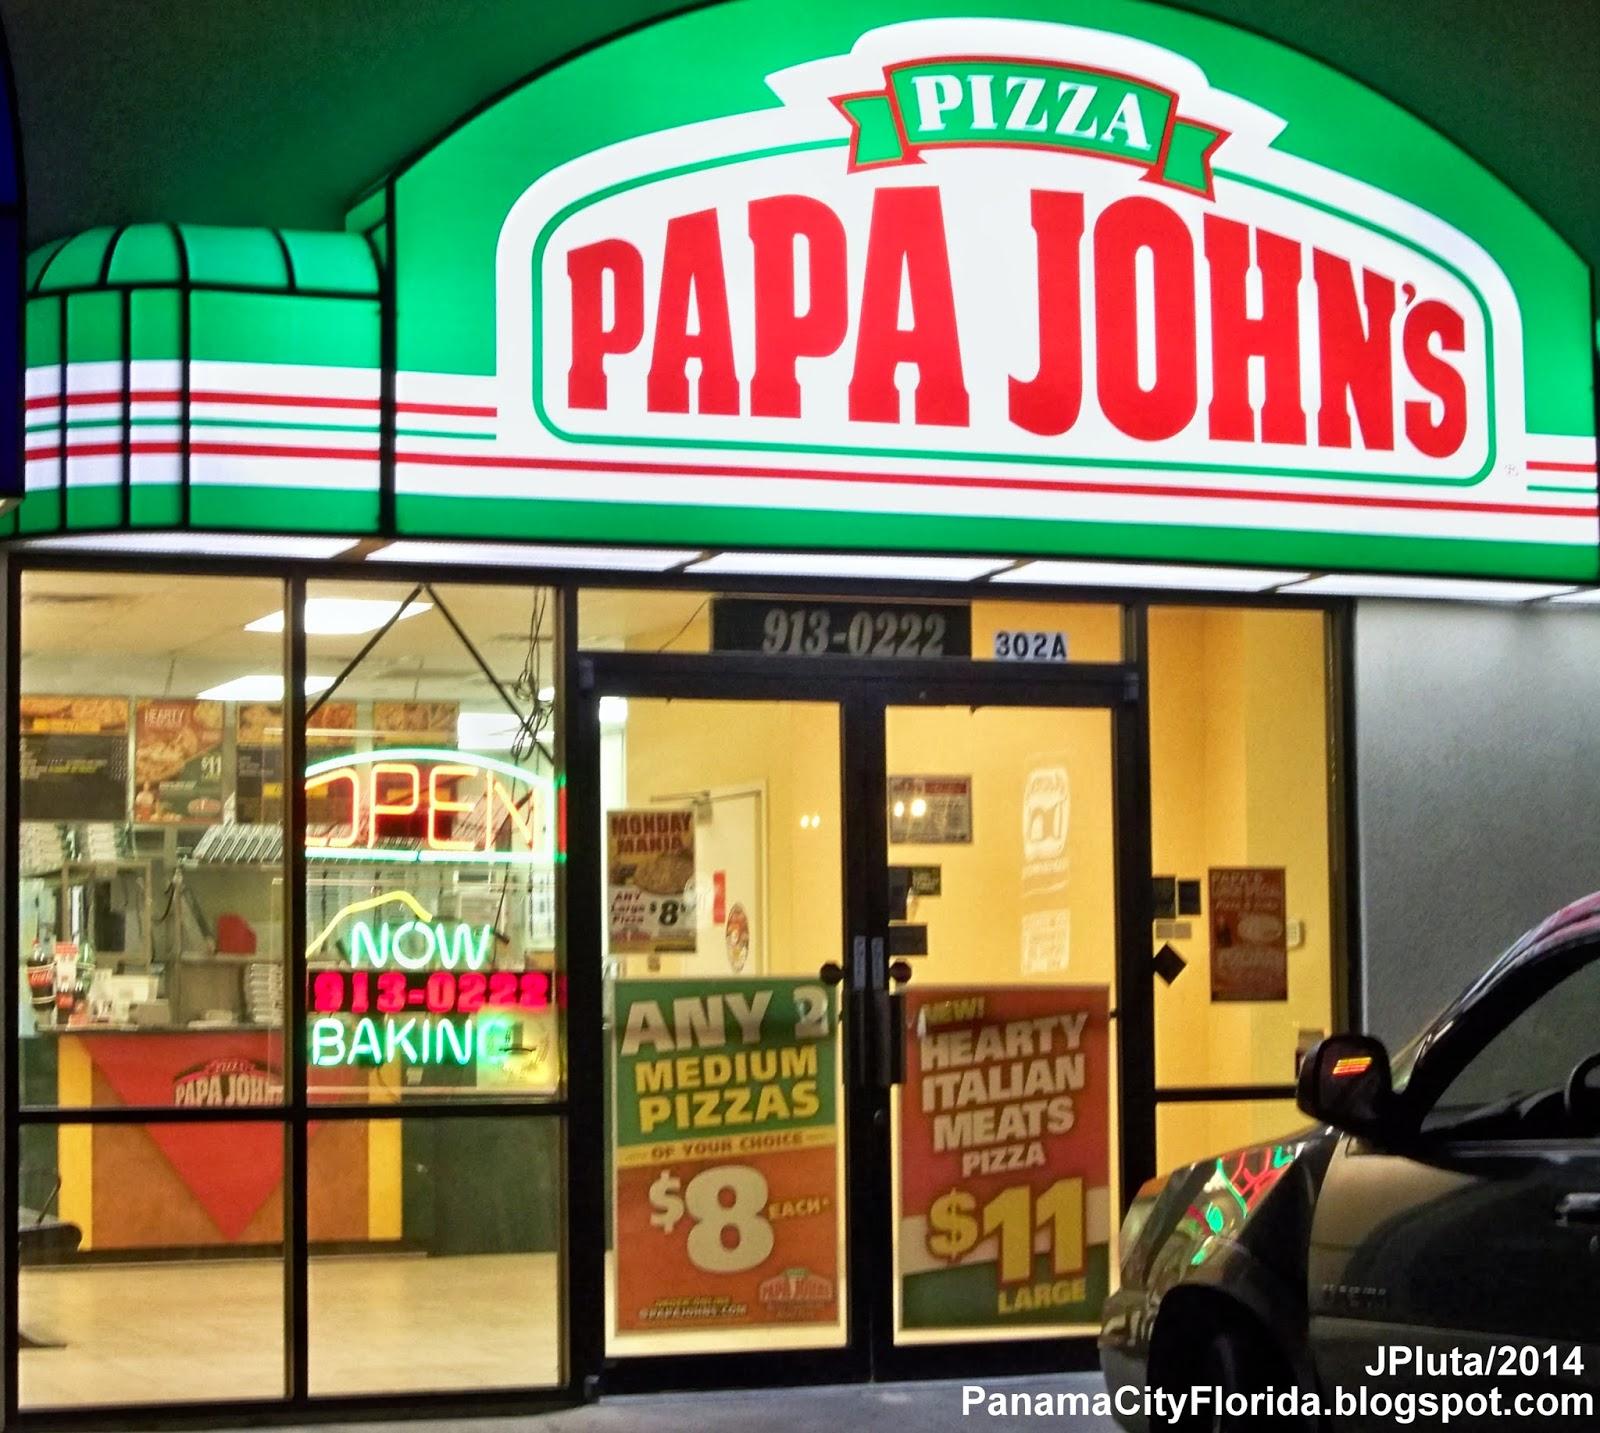 Papa Johns Coupons (Printable Coupons & Promo Codes) - 2019 - Free Printable Coupons For Panama City Beach Florida